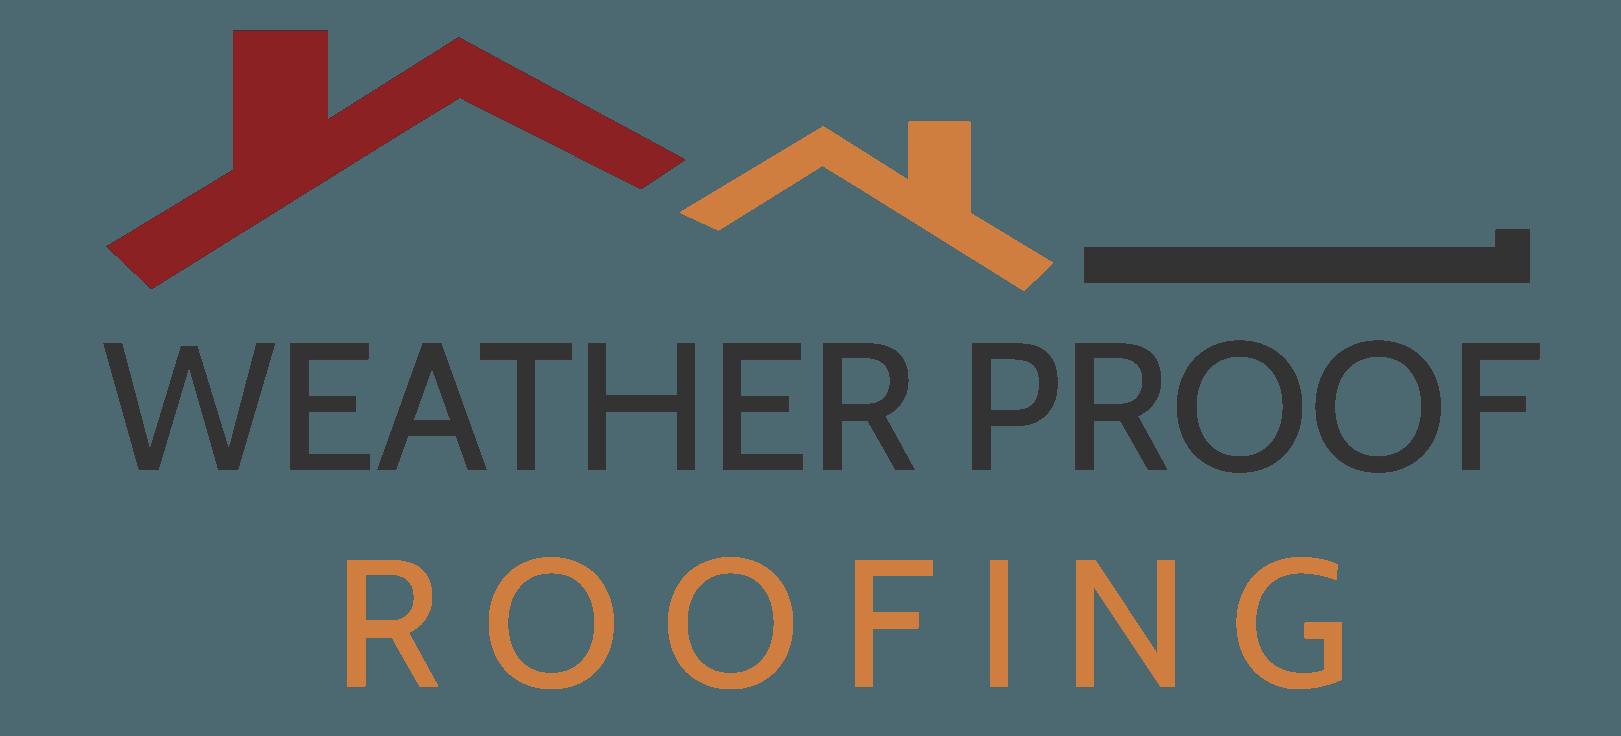 Weatherproof Roofing company logo